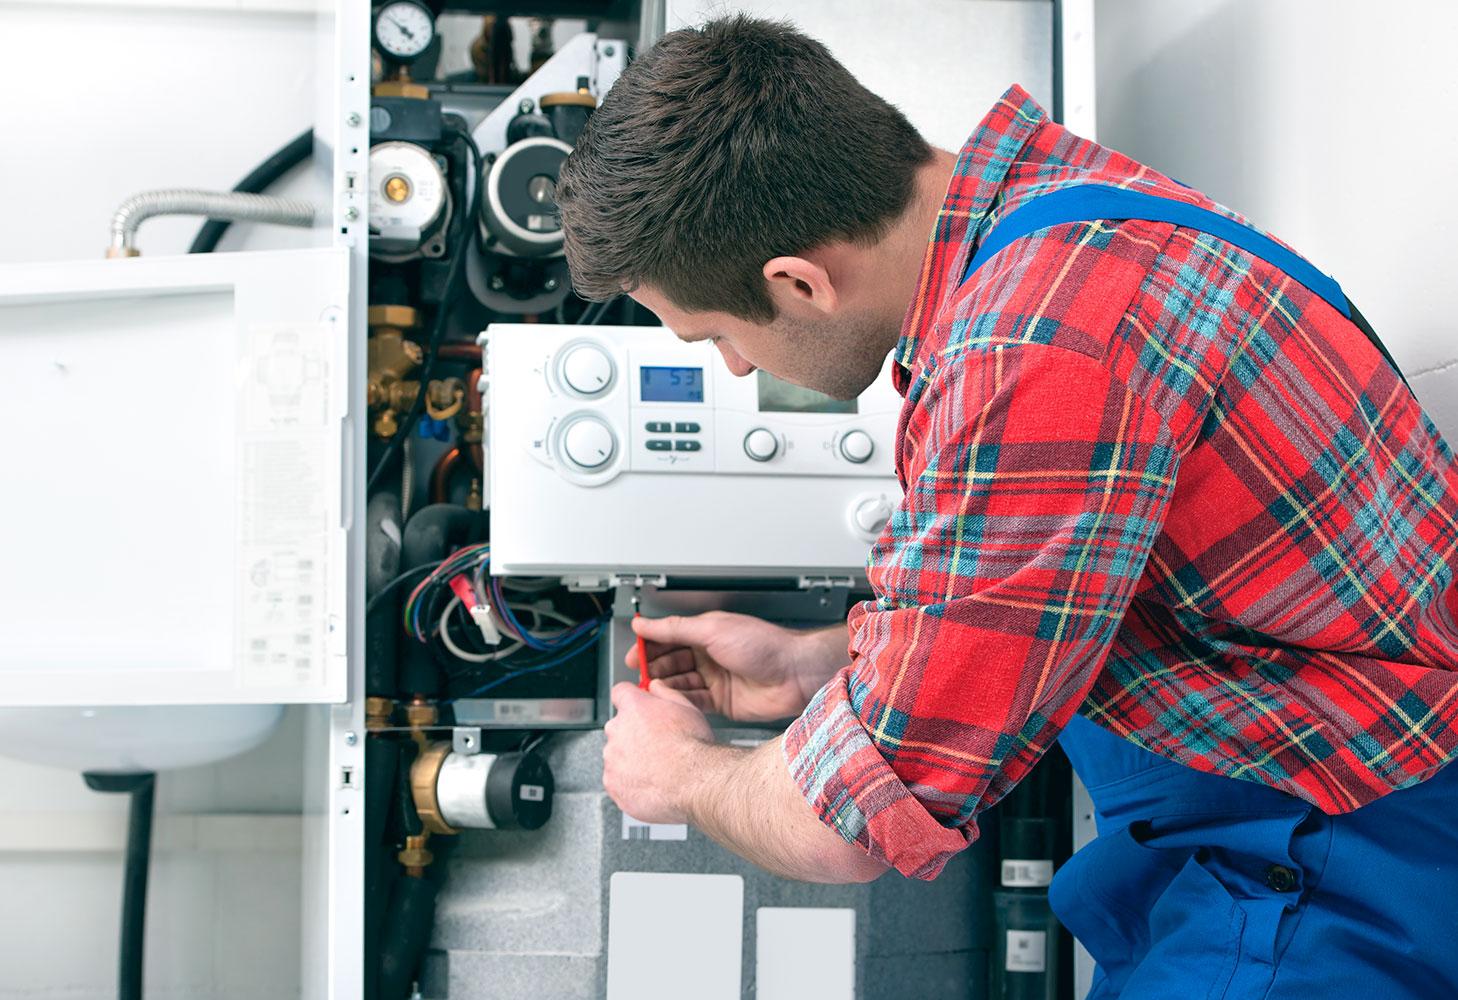 General plumbing and heating